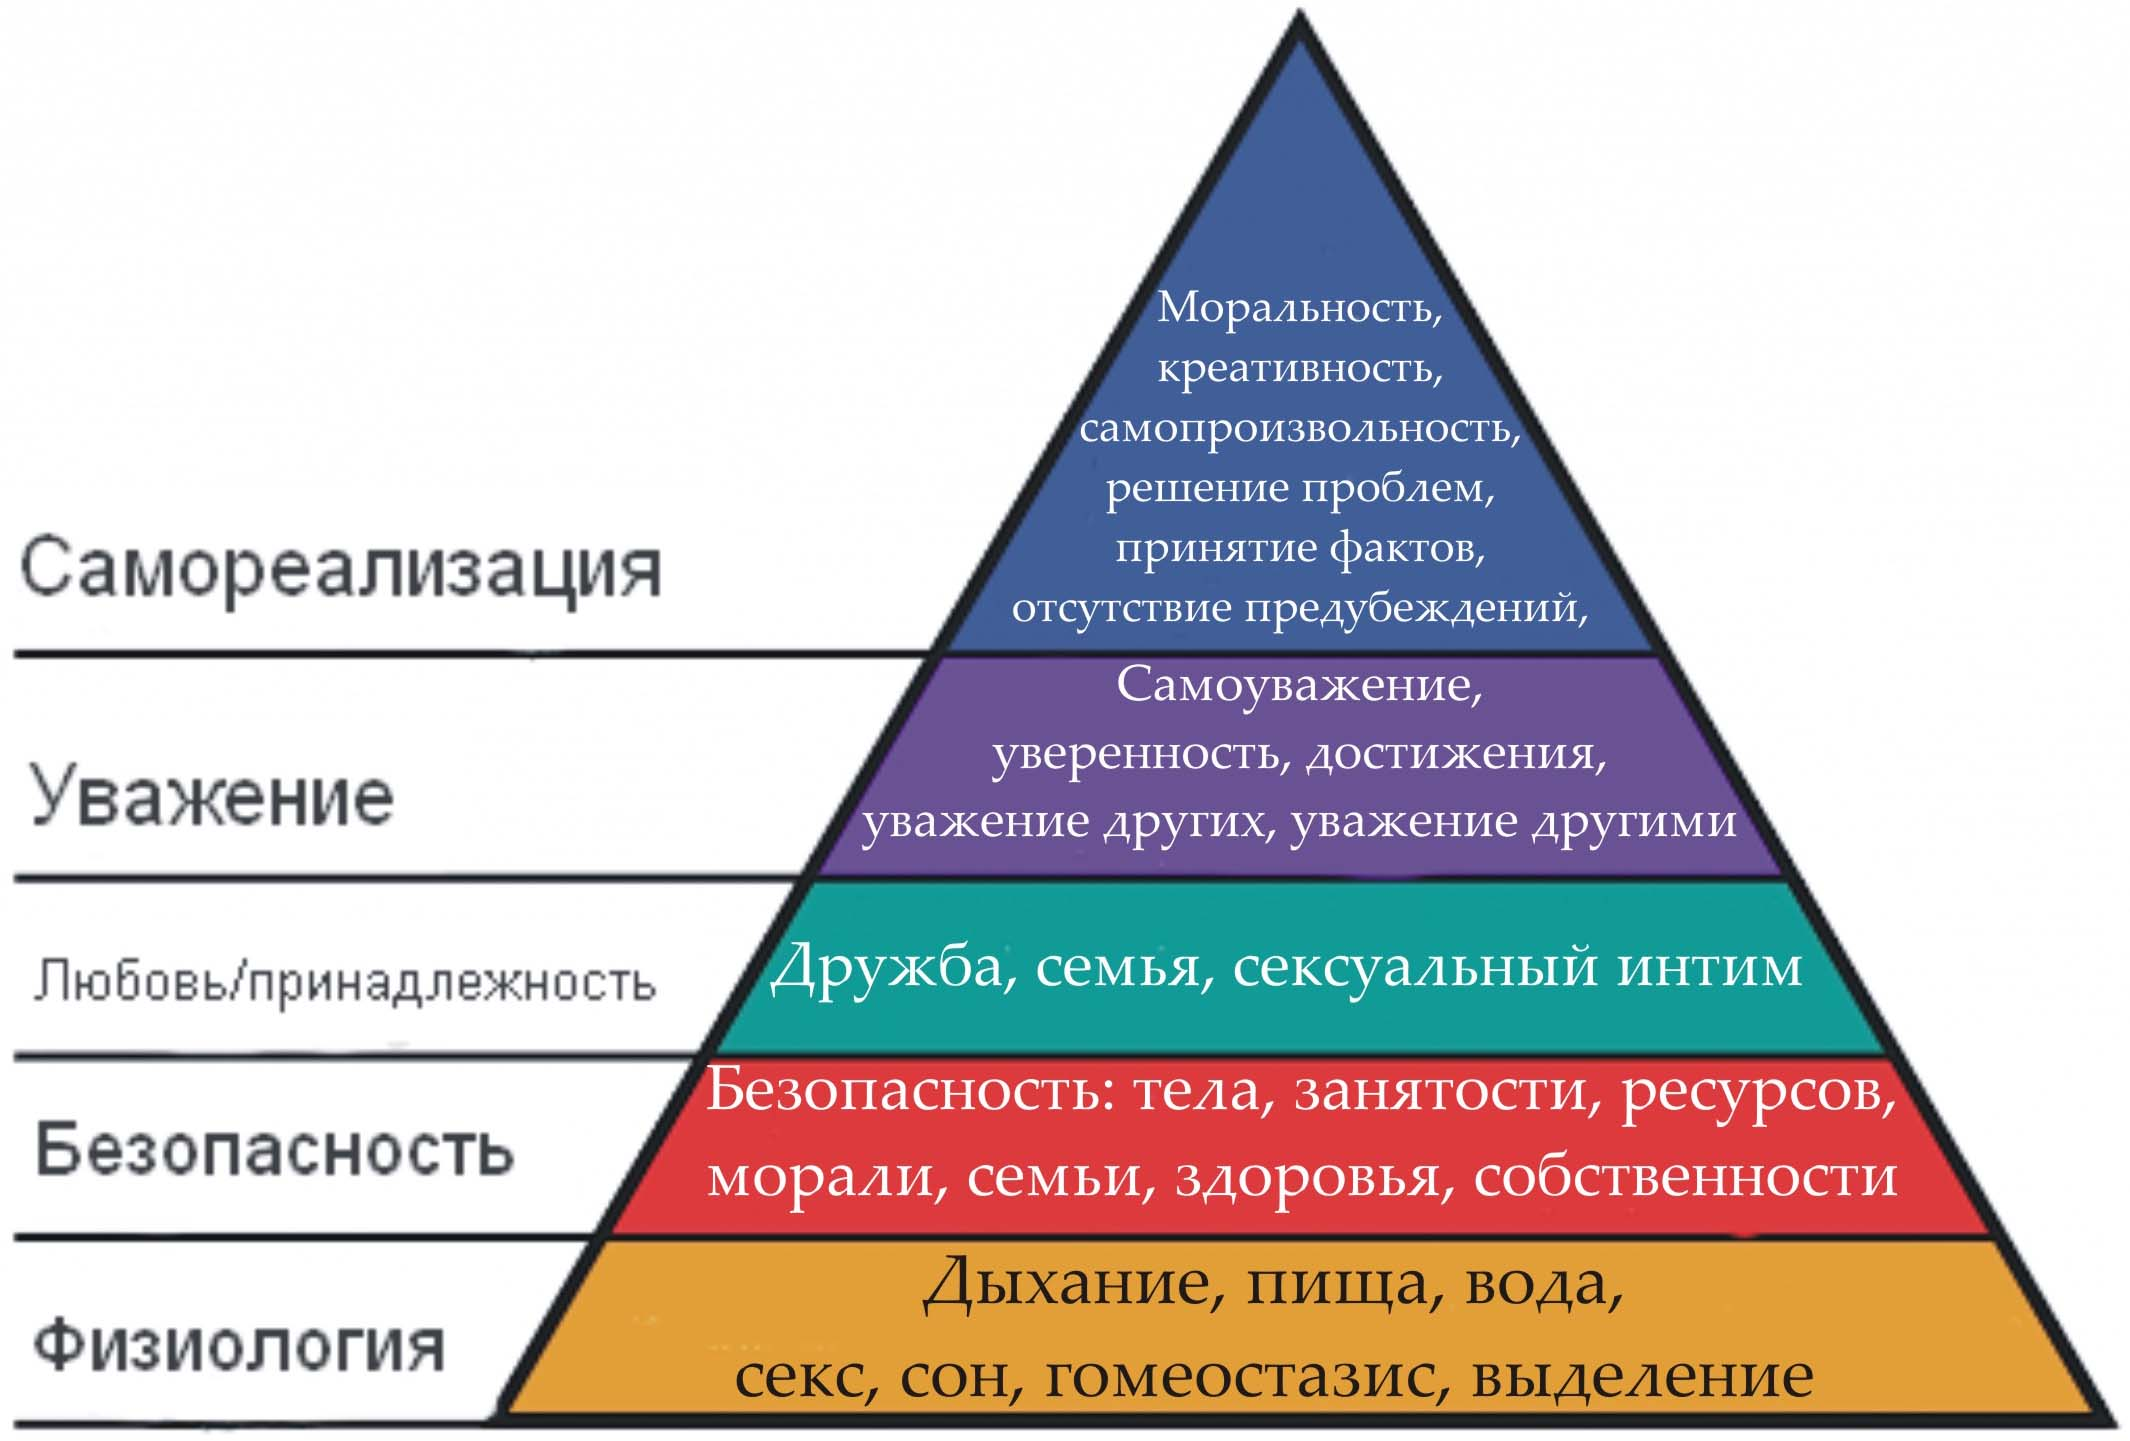 Maslou_rus